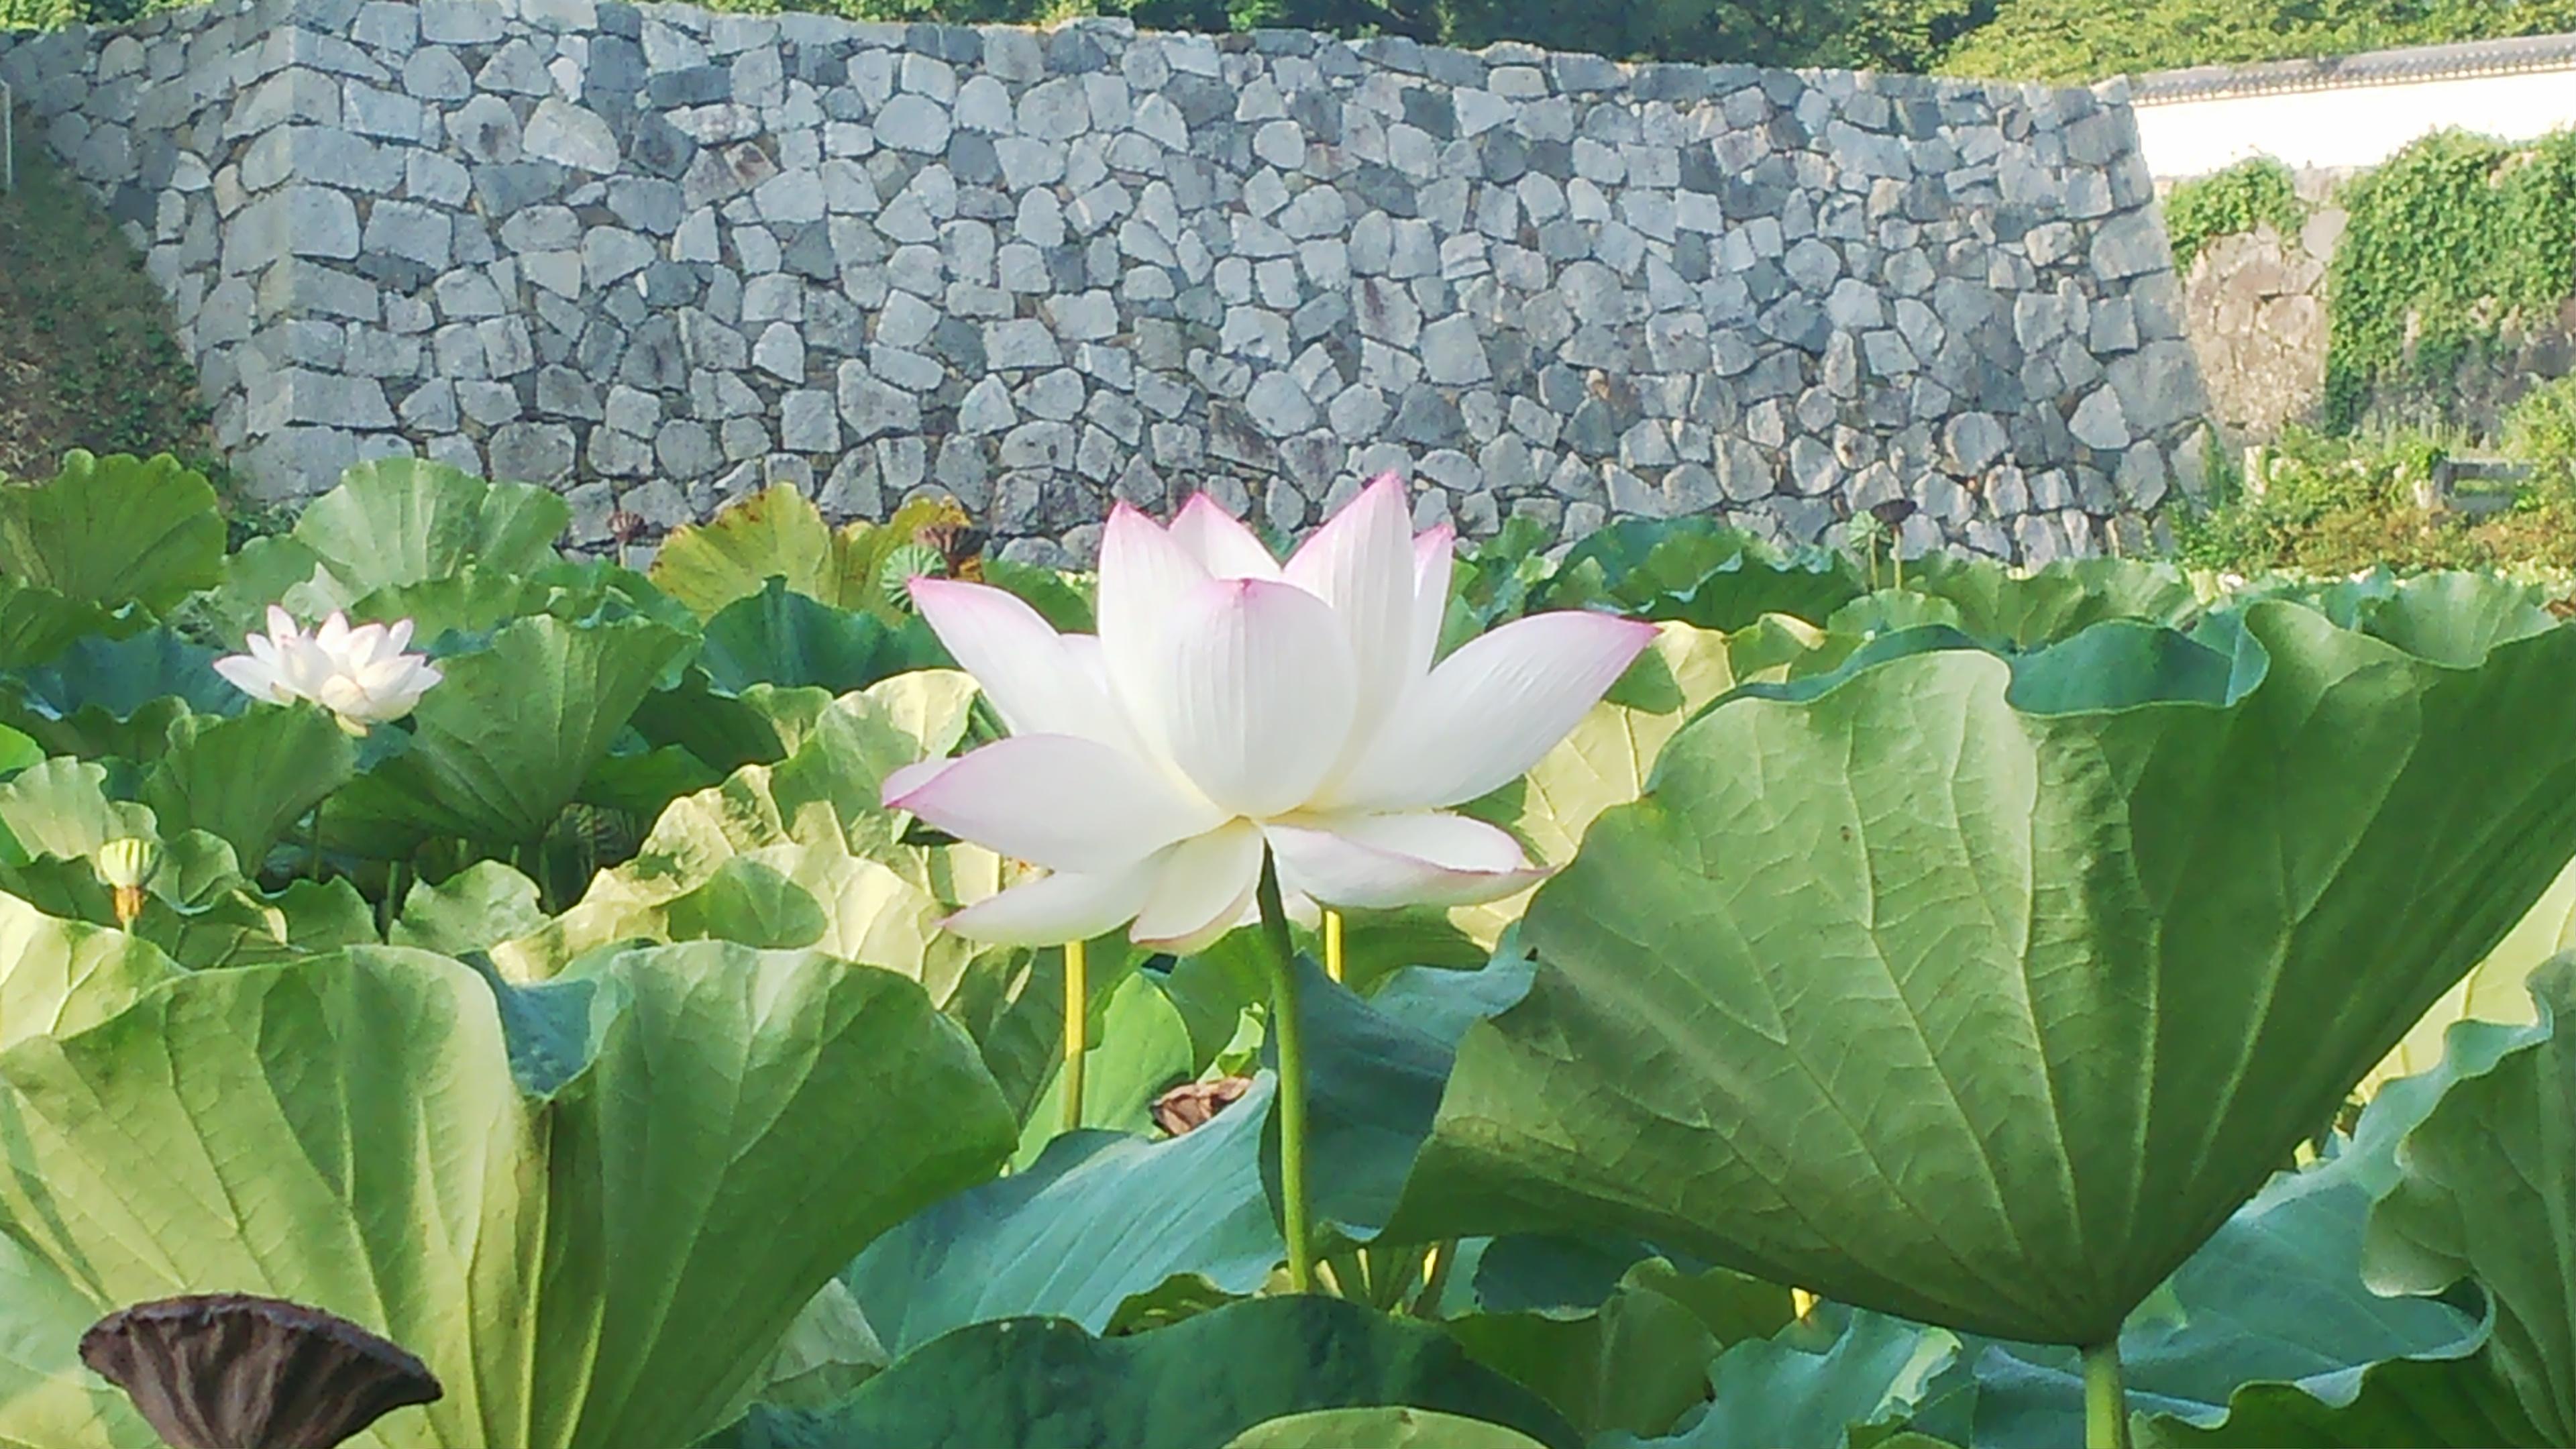 http://www.midorimachi.jp/blog/%E2%91%A0%EF%BC%97%EF%BC%9A%EF%BC%90%EF%BC%94.JPG